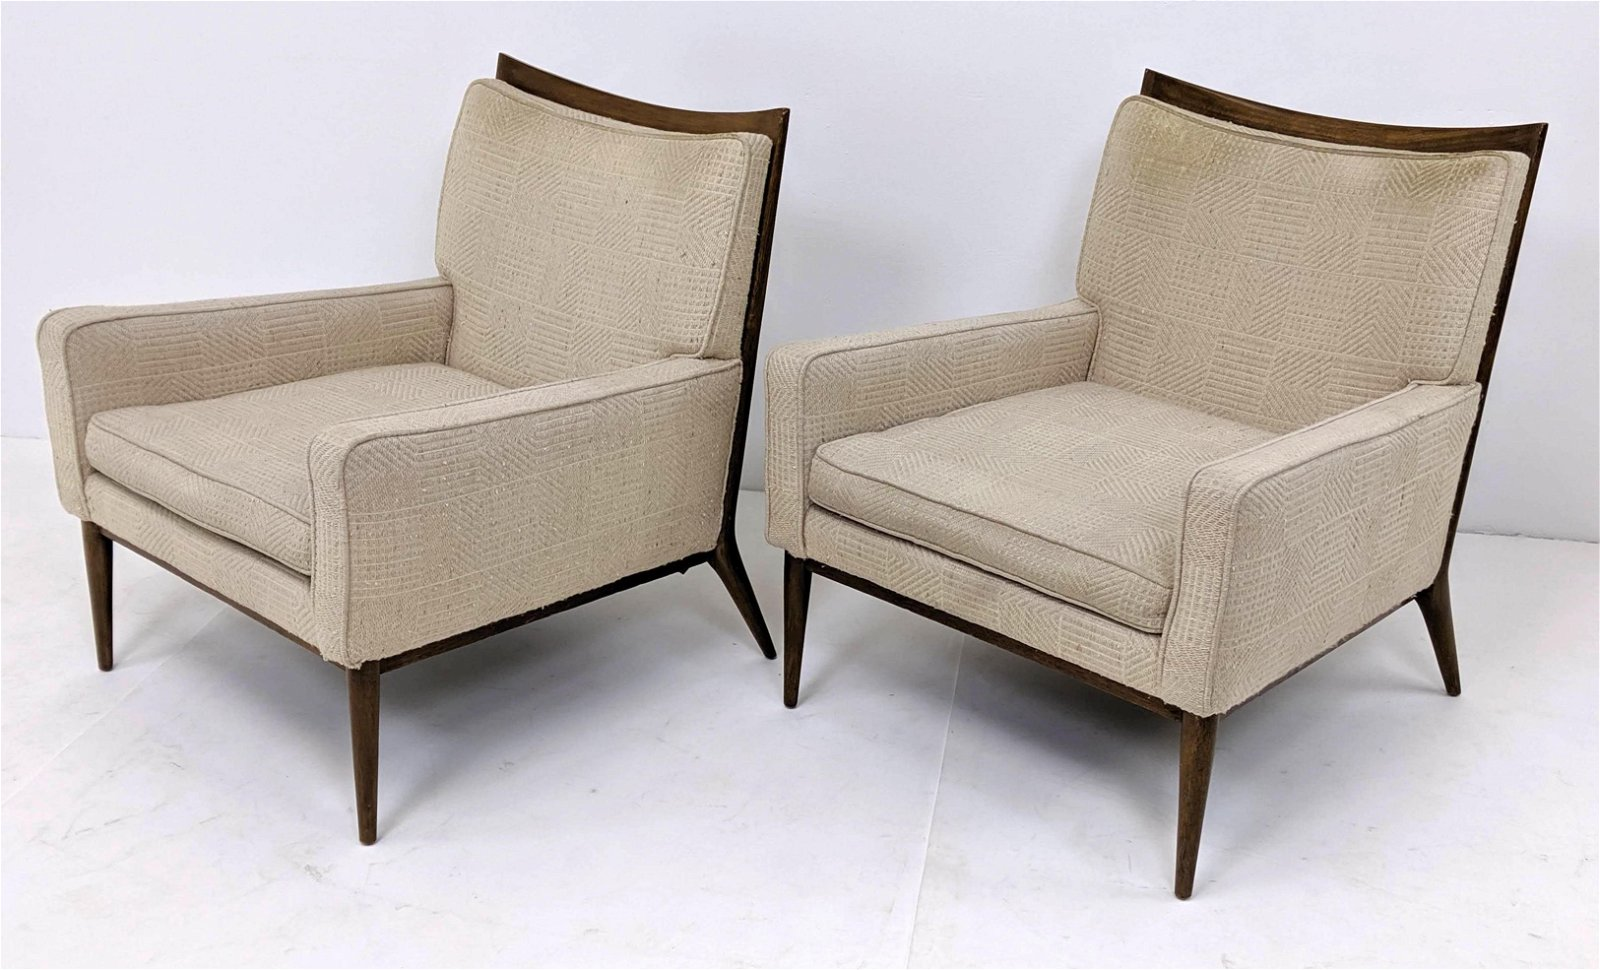 Pr PAUL McCOBB American Modern Walnut Lounge Chairs. Te